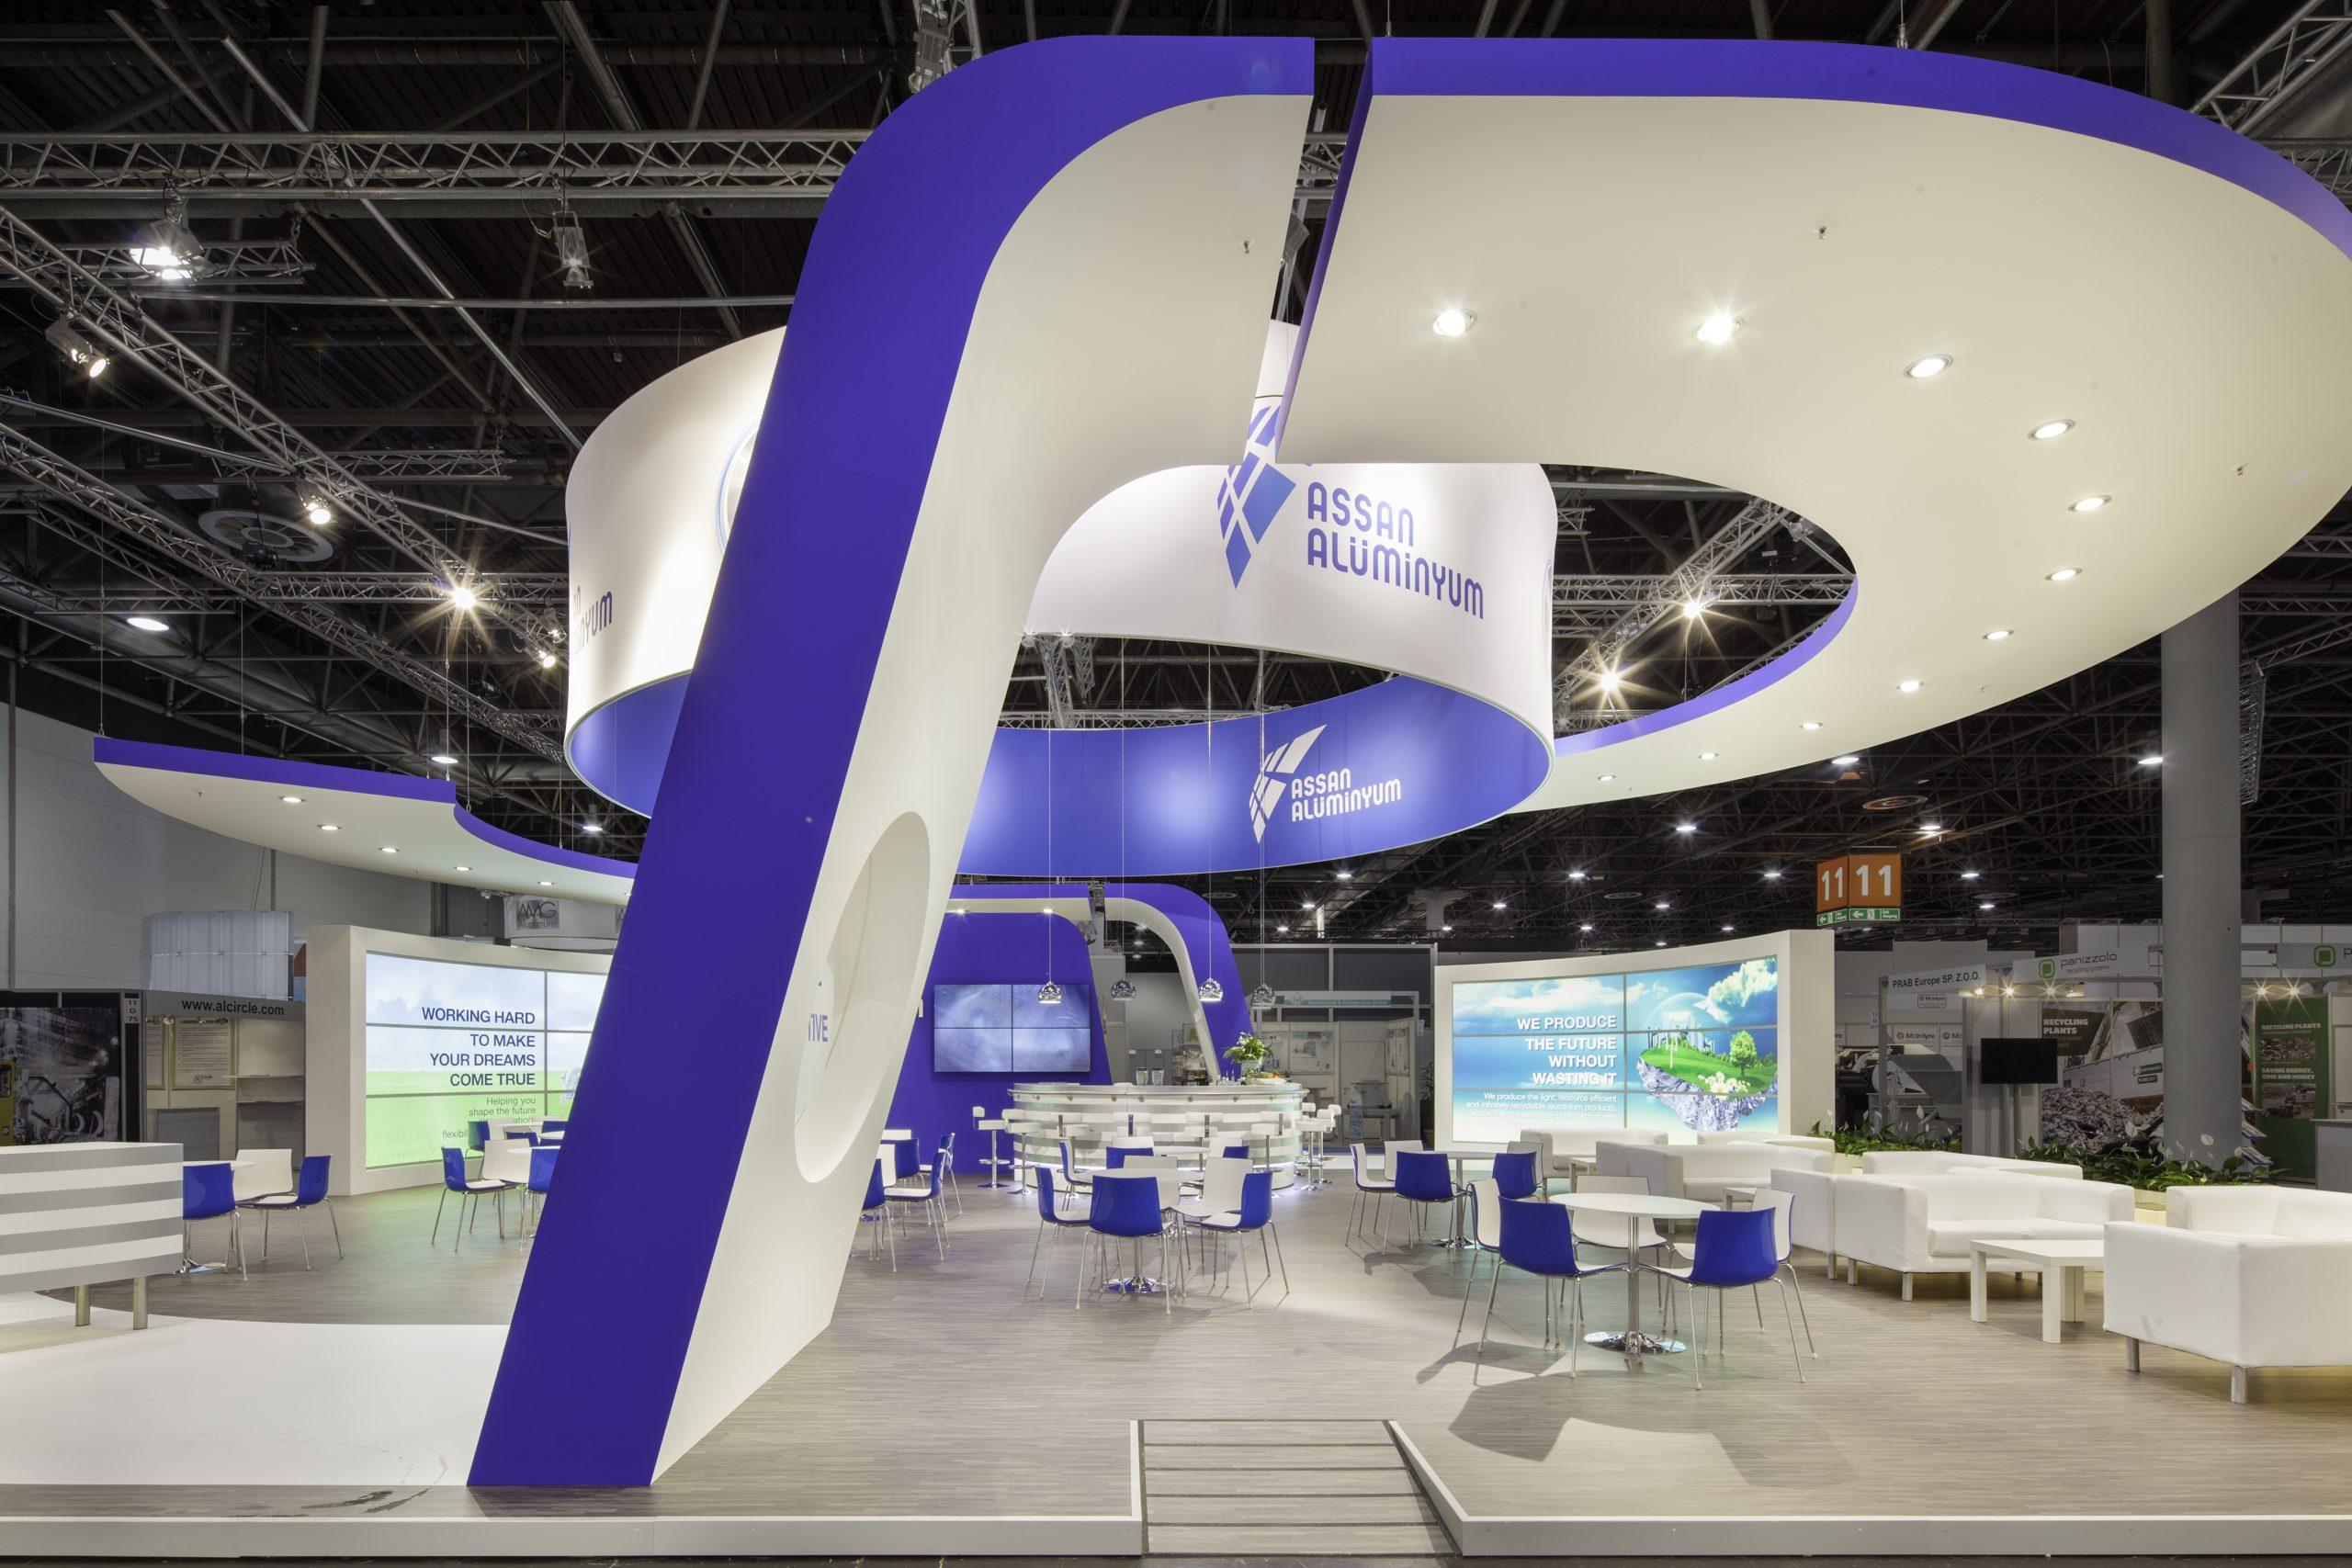 CAS Exhibition Partners - Assan - Aluminium 2016 - Dusseldorf - Standbouwfotografie #5198